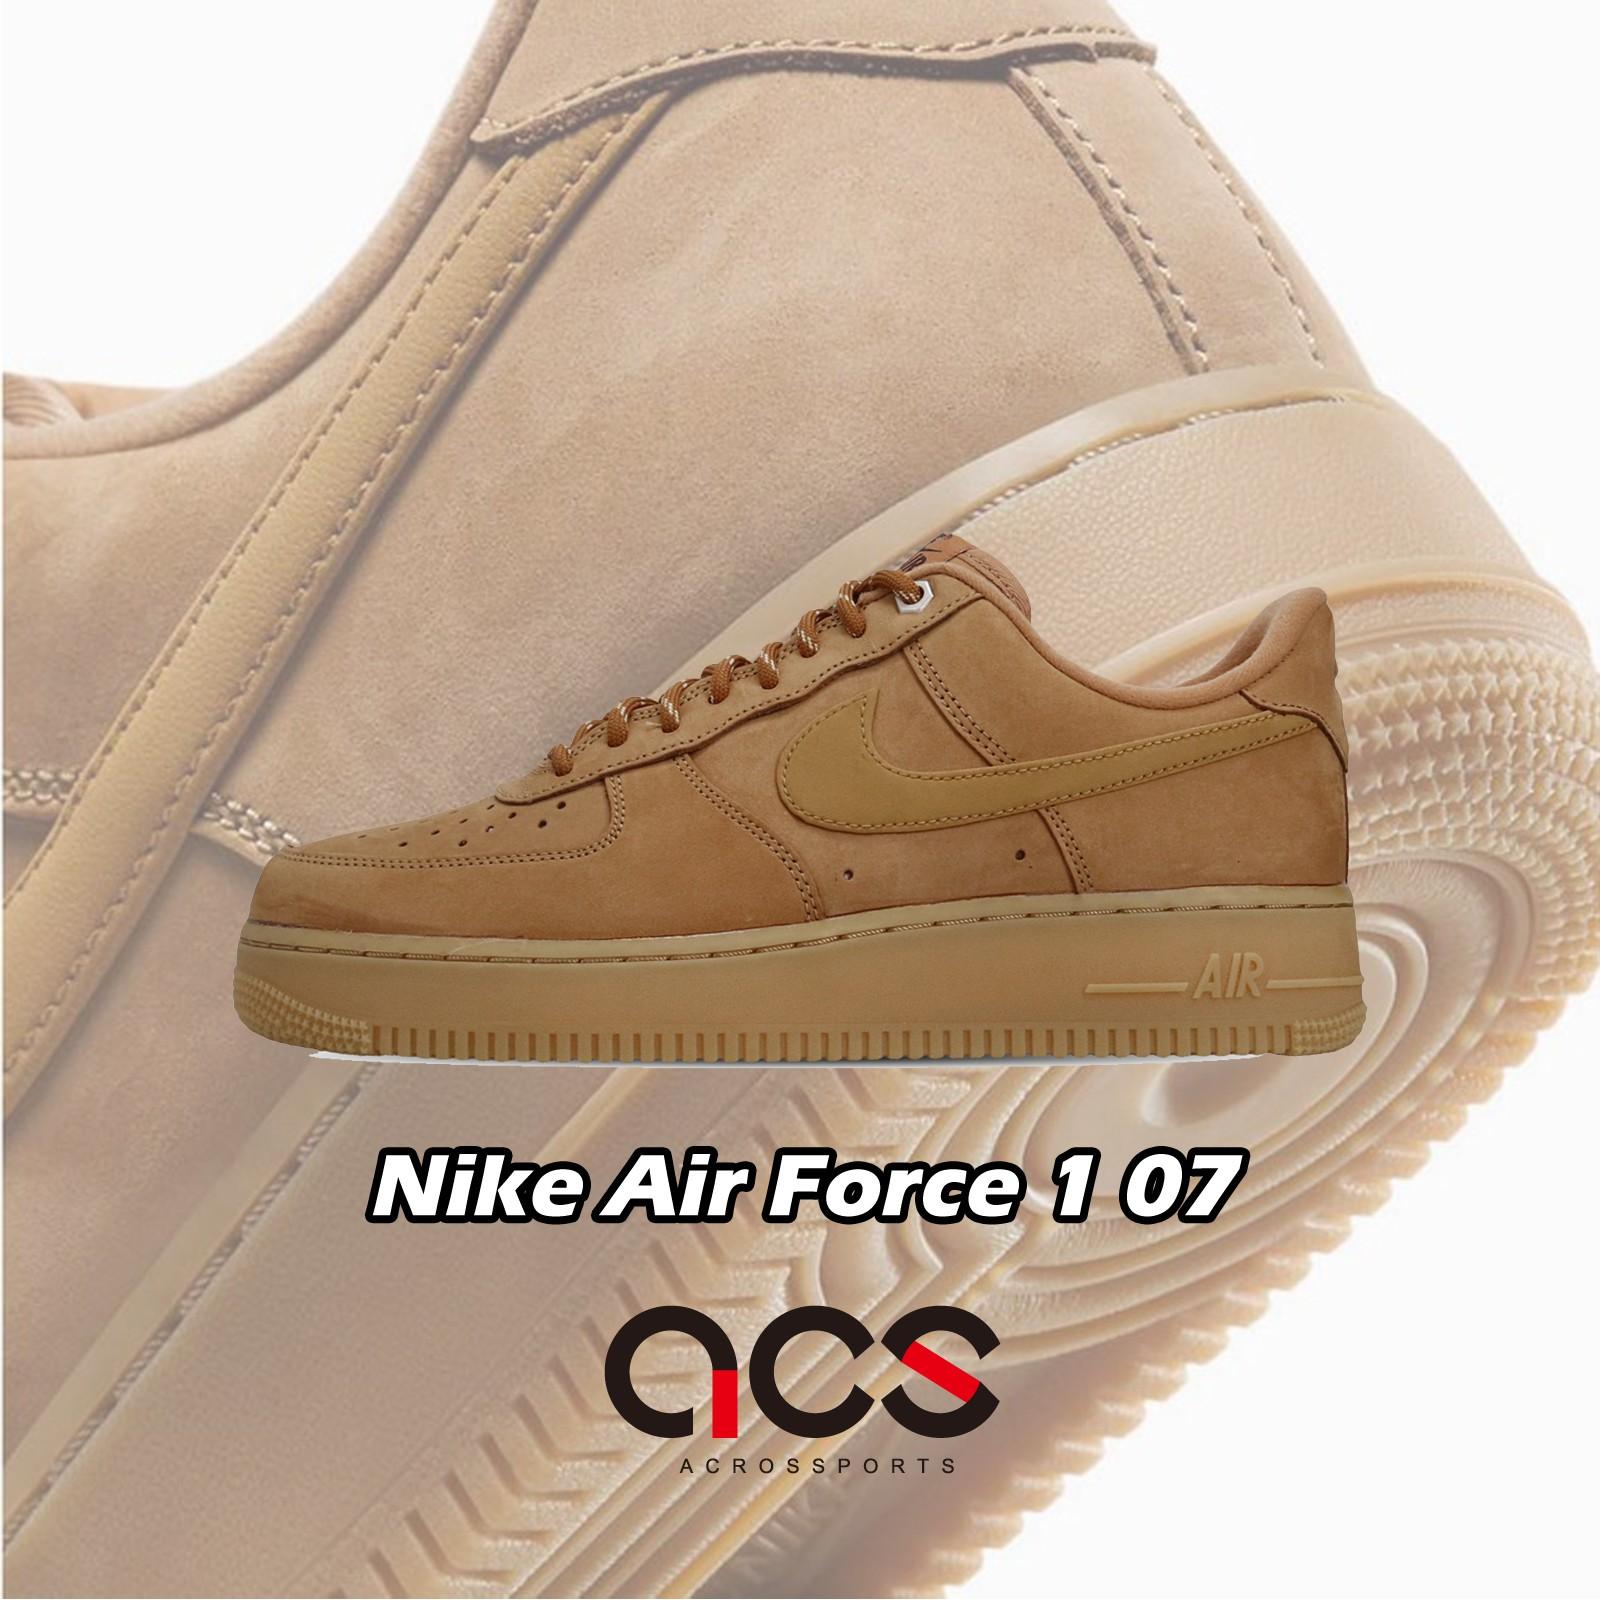 Nike 休閒鞋 Air Force 1 07 WB Wheat 小麥 男鞋 Flax【ACS】 CJ9179-200